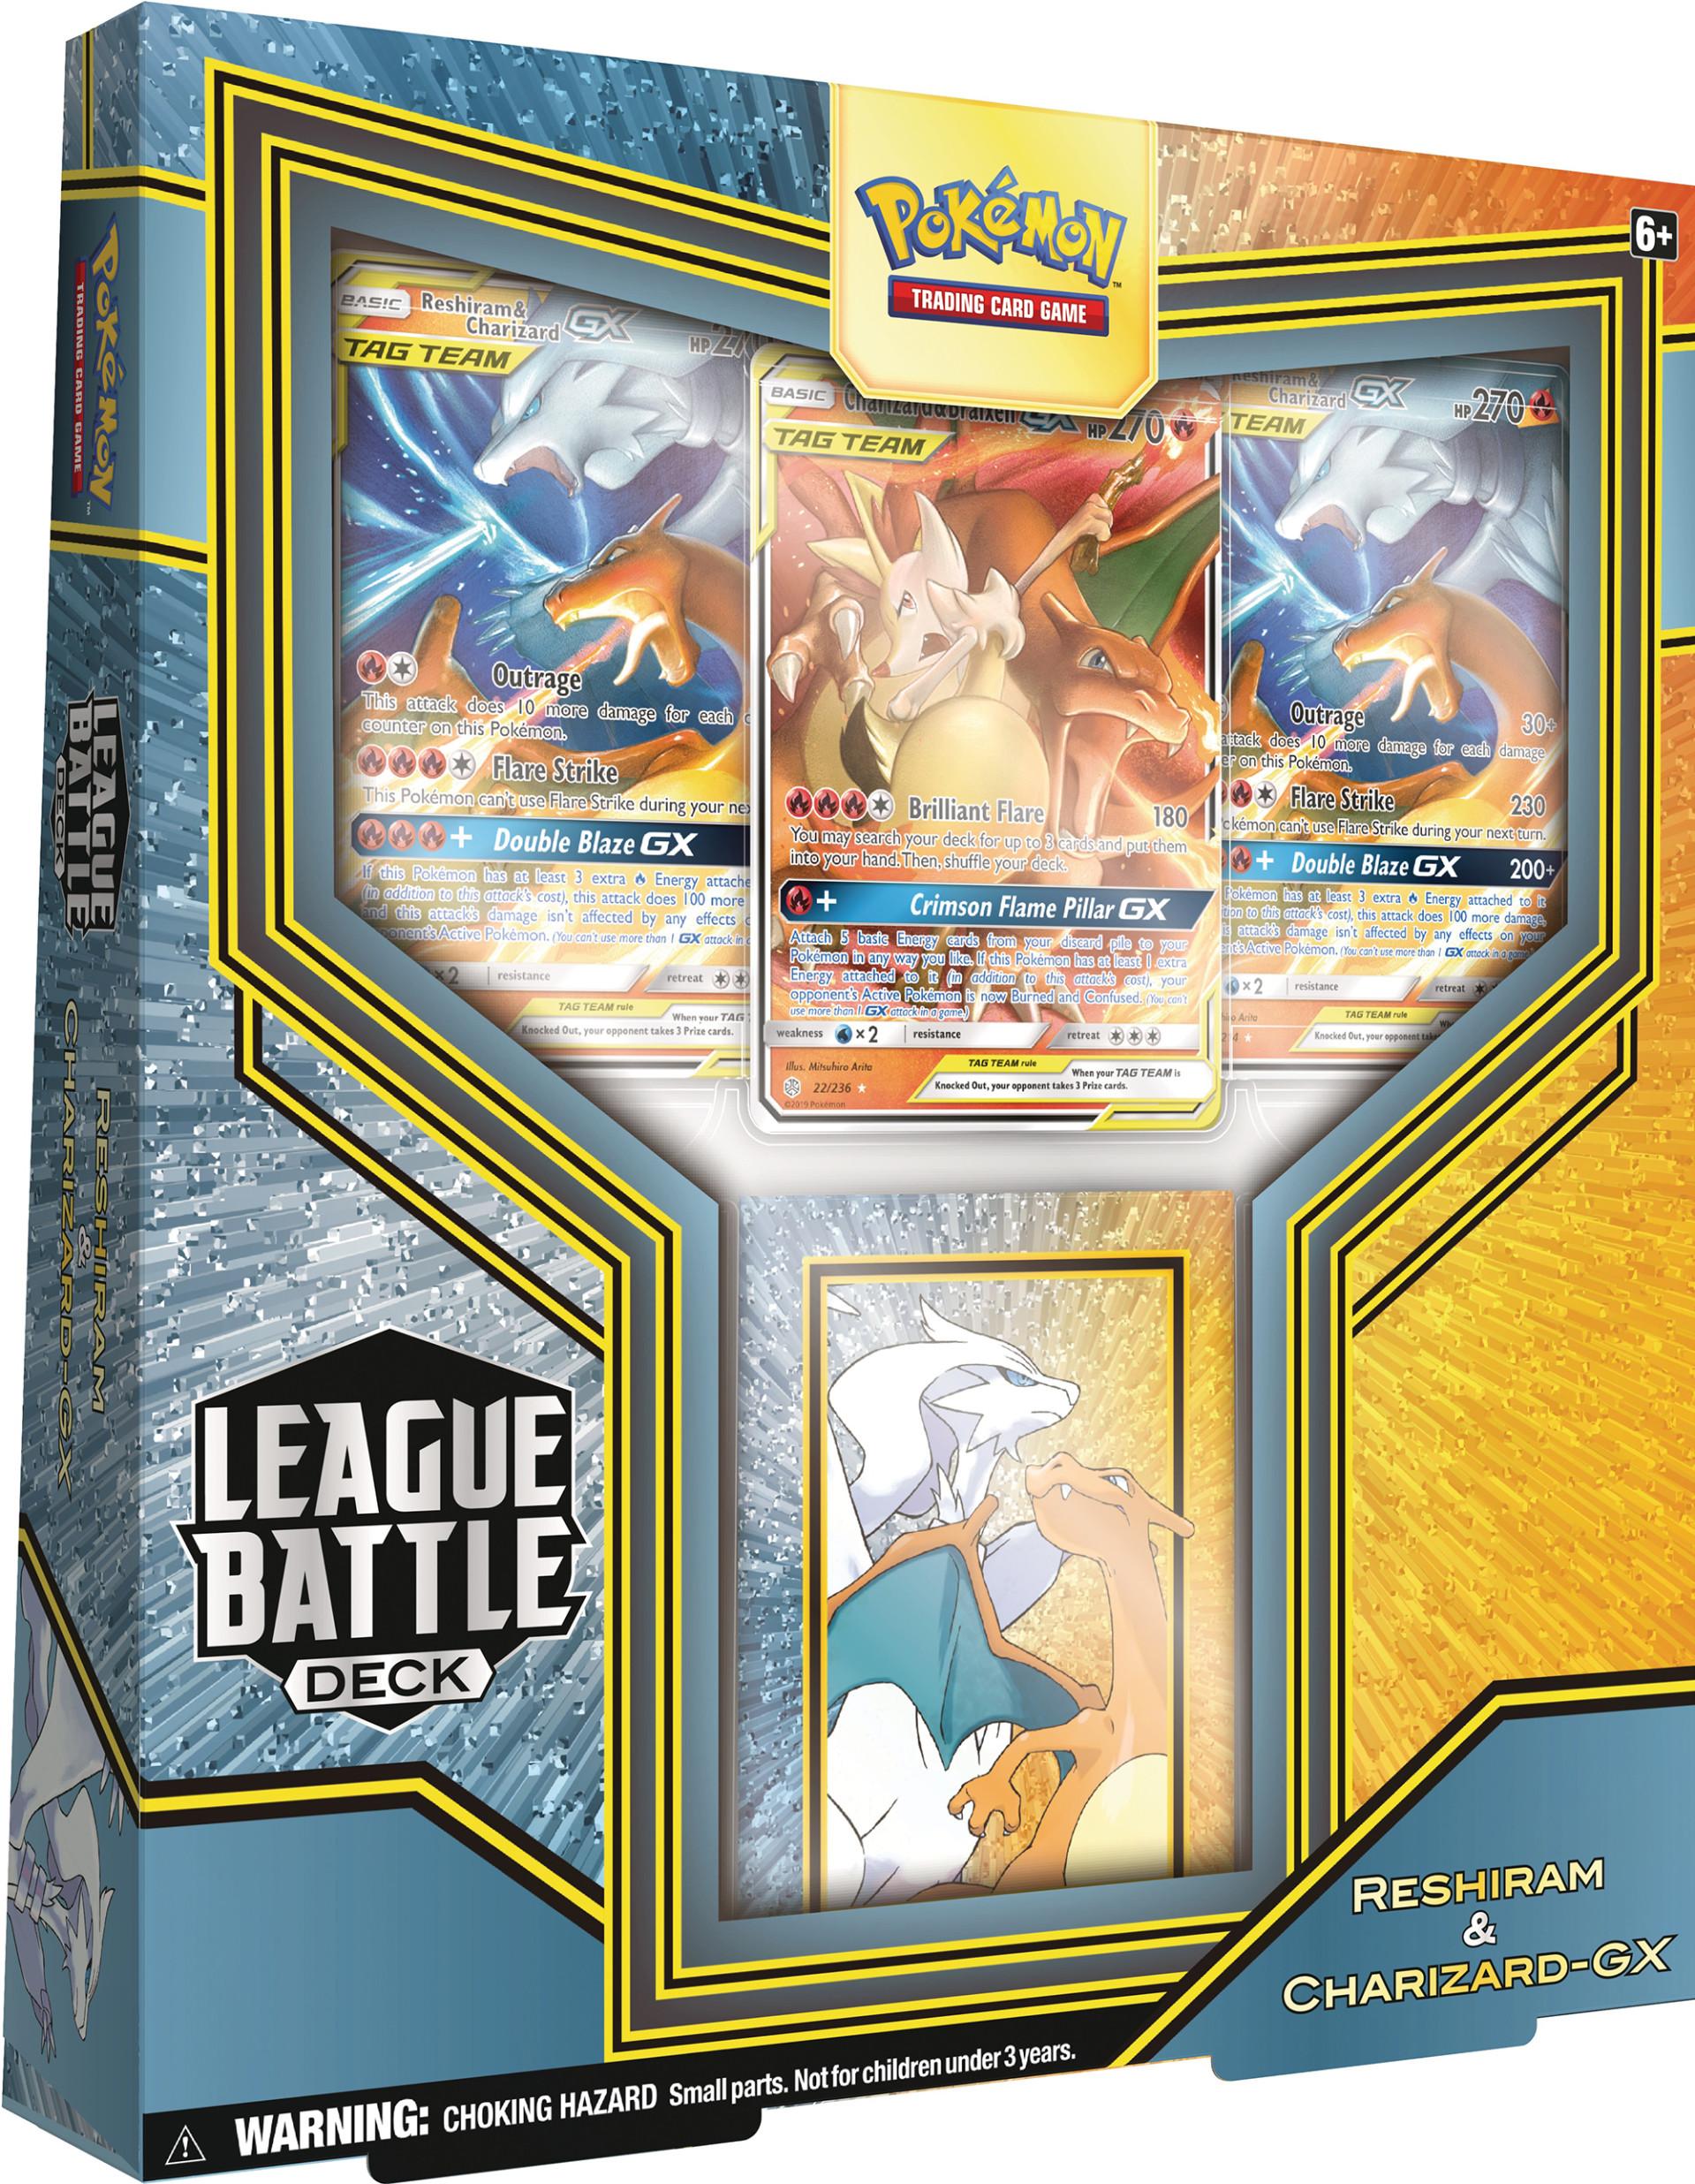 League Battle Decks [Reshiram & Charizard GX]